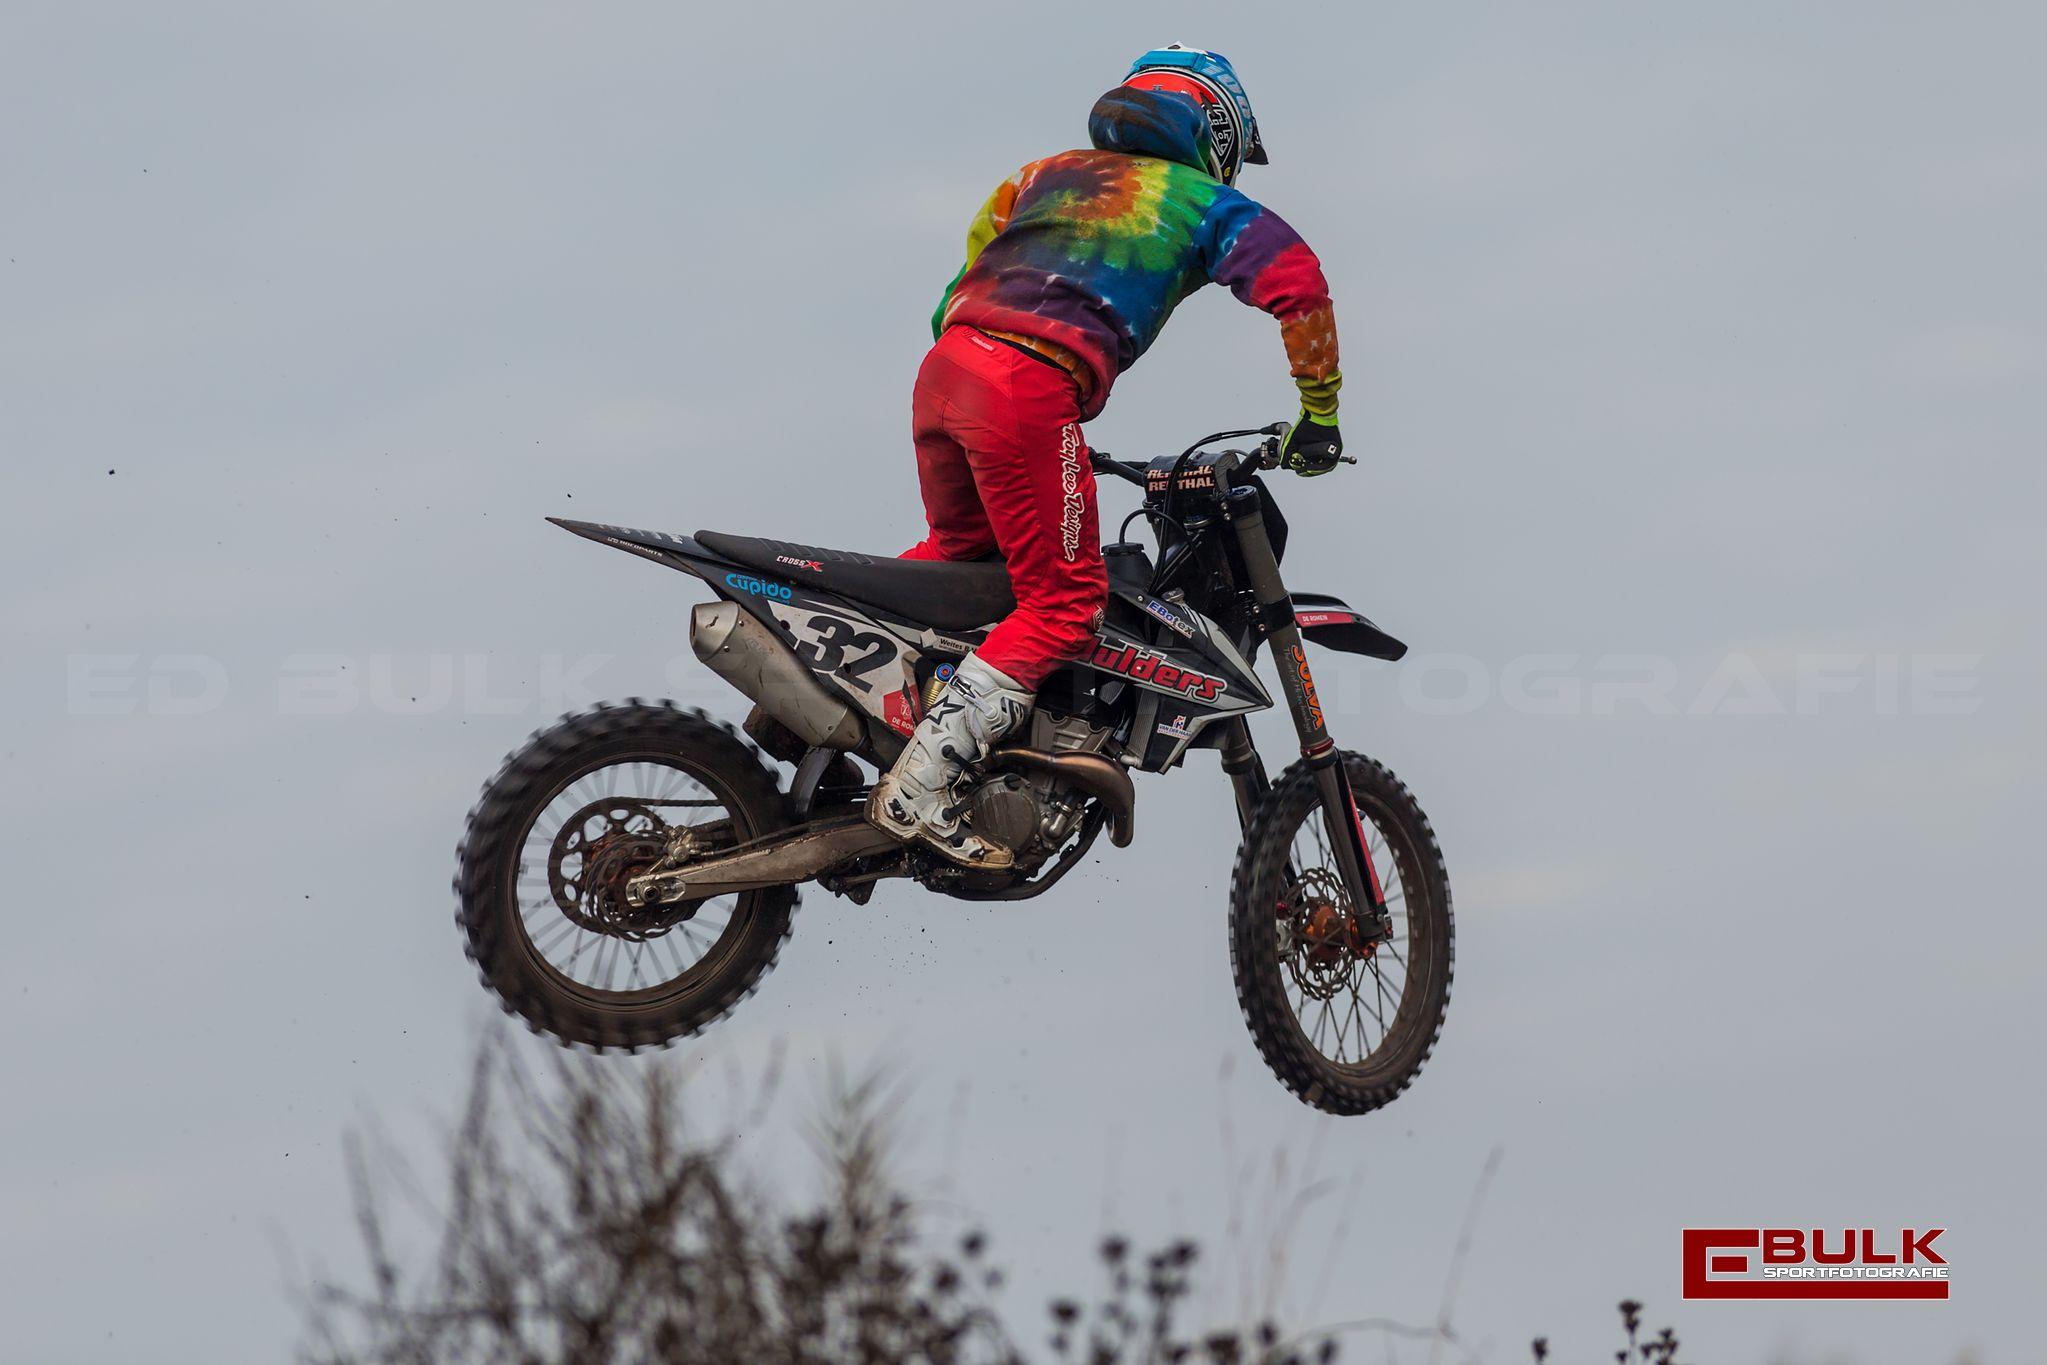 eebs1071-ed_bulk_sportfotografie